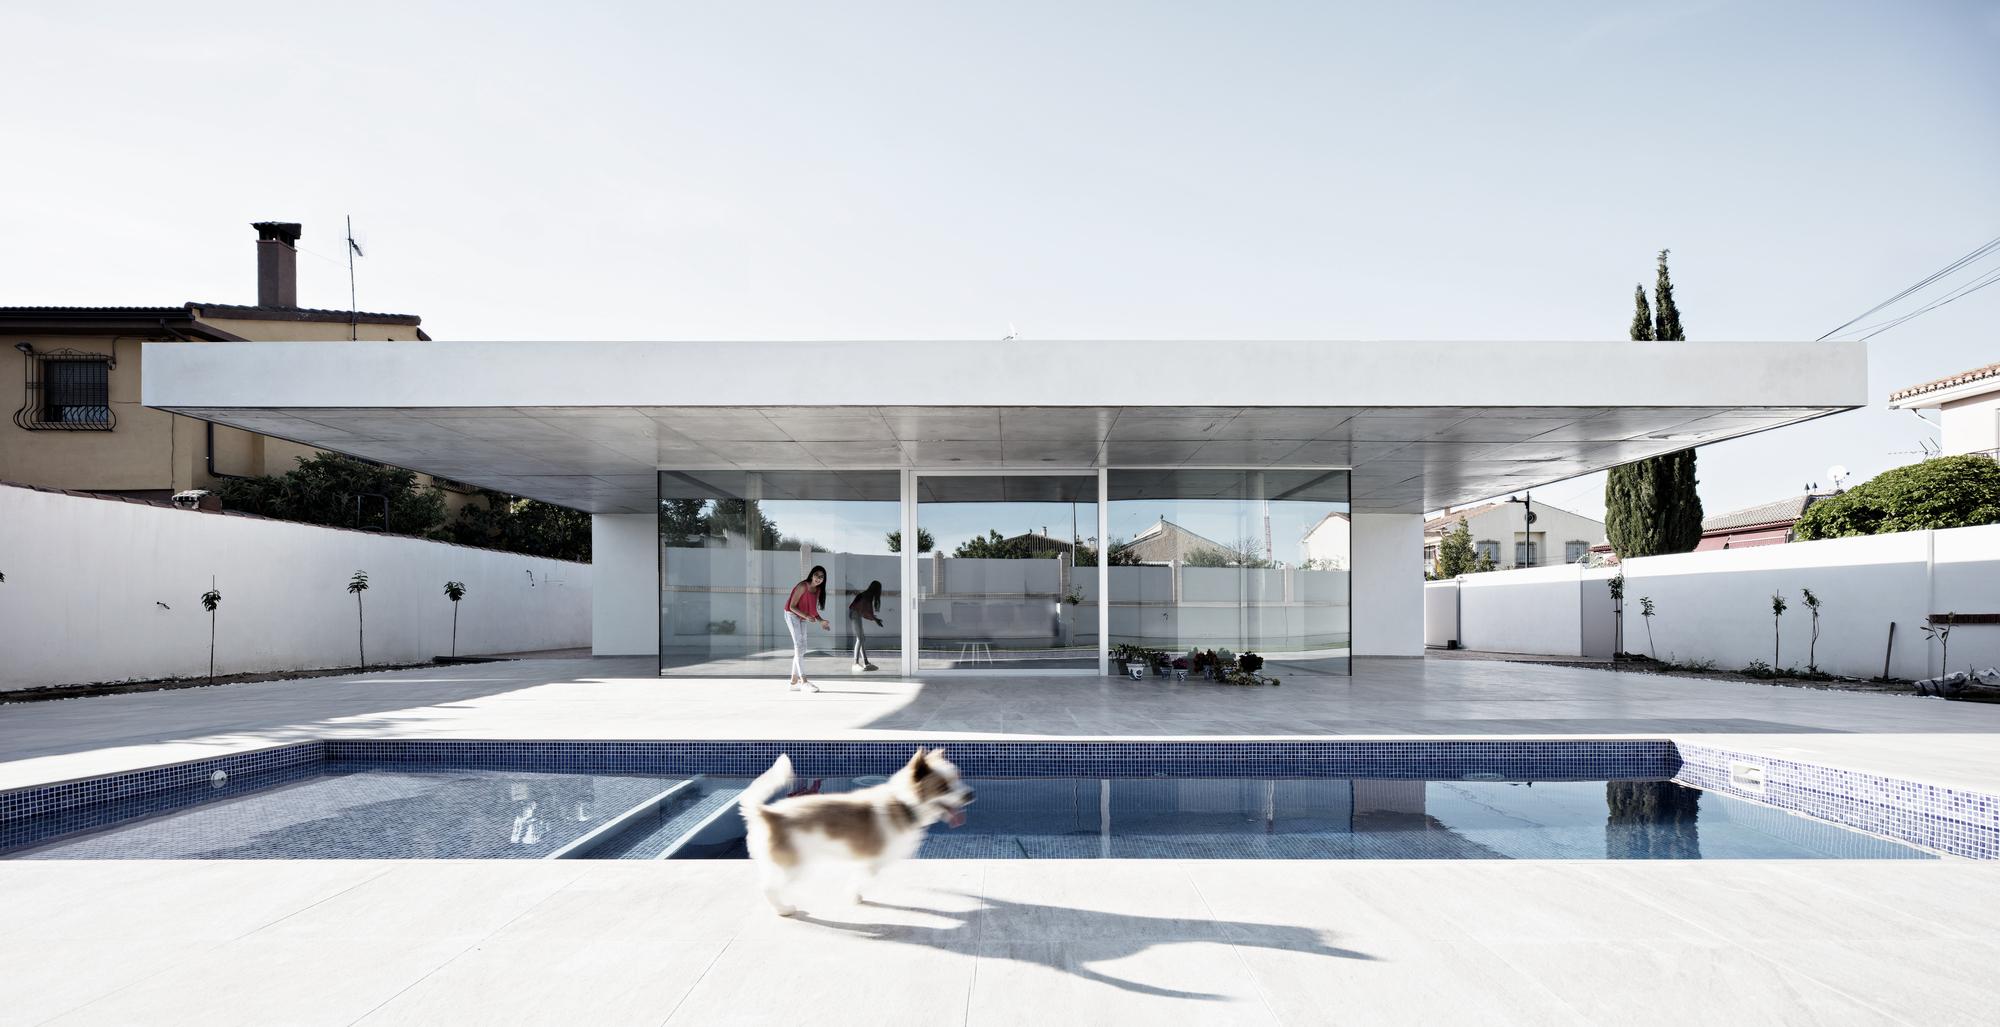 The House of Jesus / Rubens Cortés Arquitectos